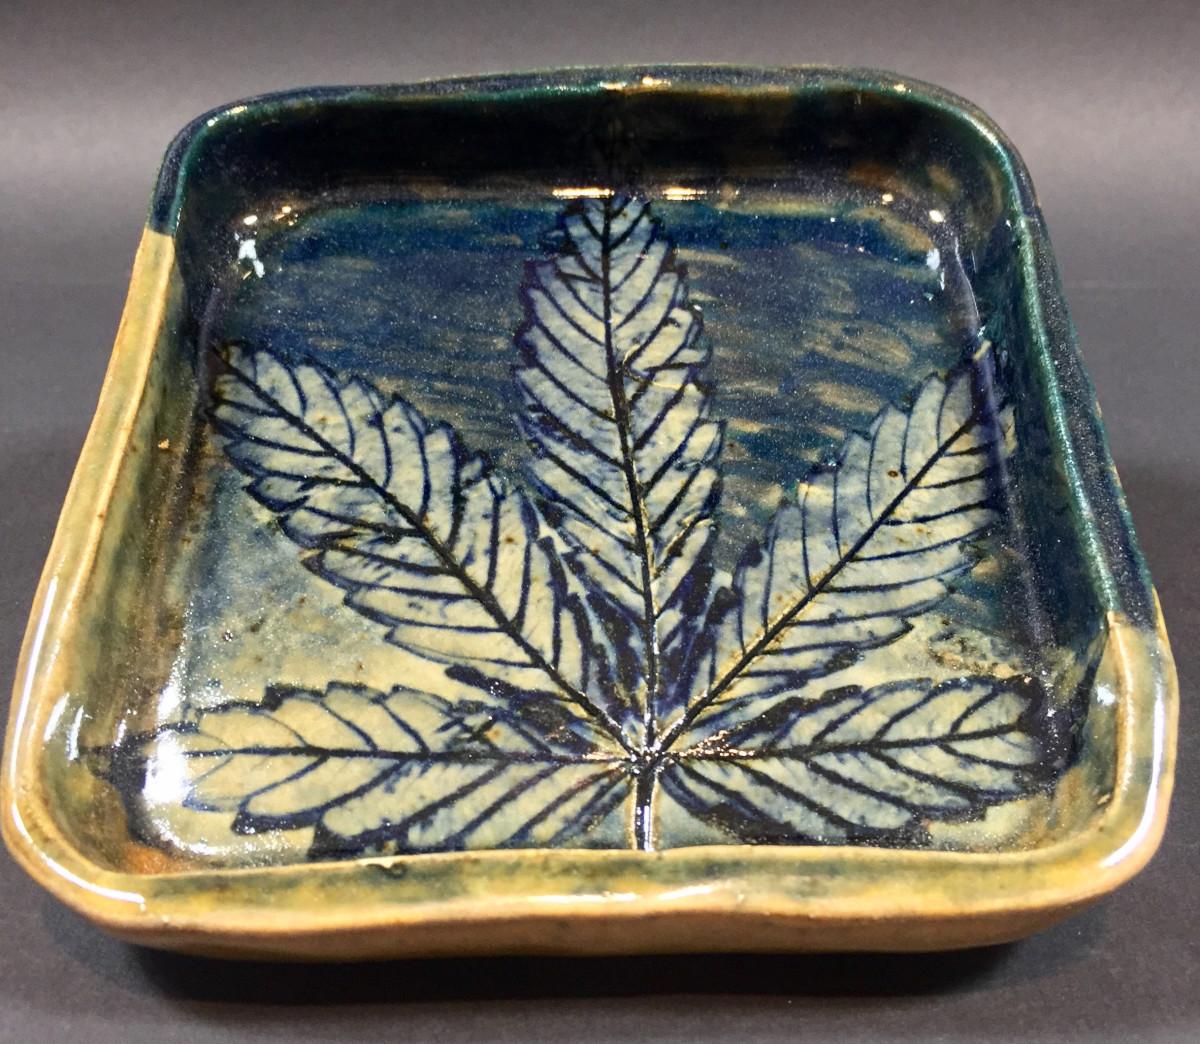 Big Leaf tray by Nell Eakin